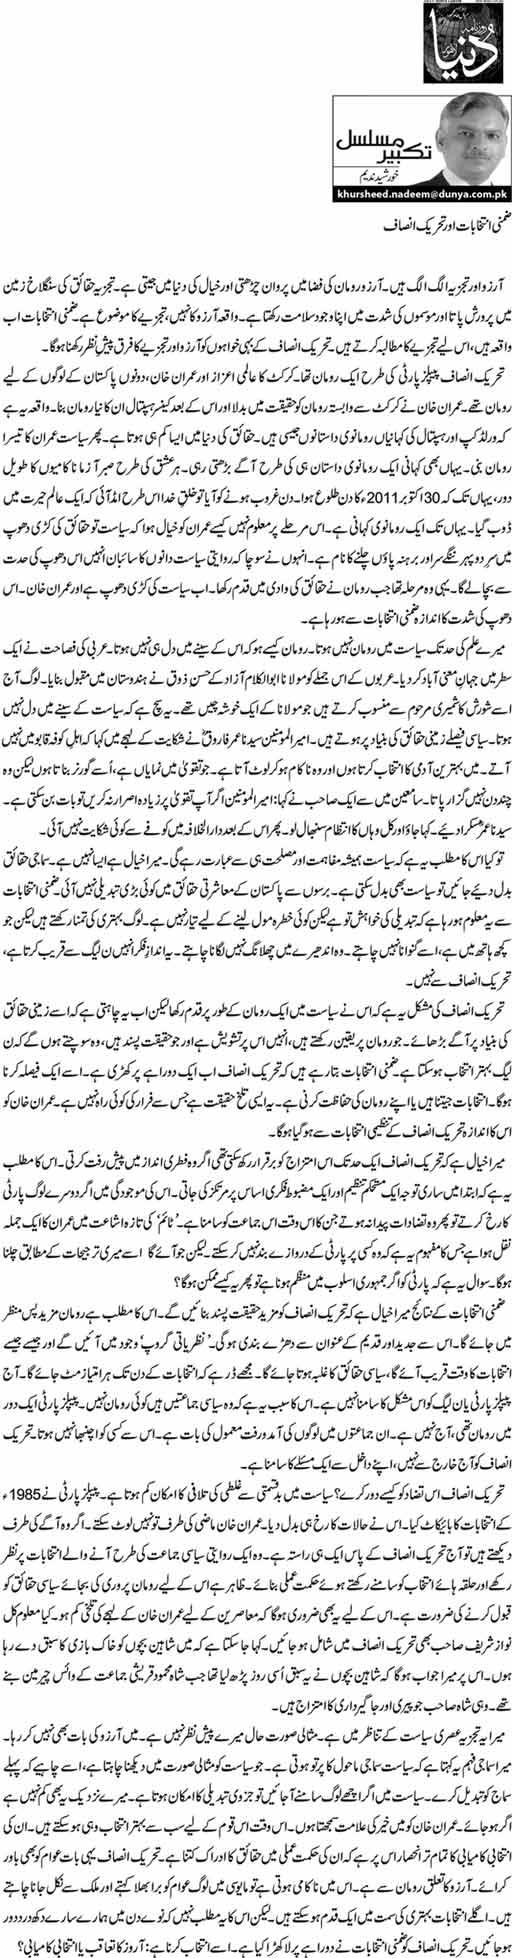 Zimni intikhabaat aur tehreek e insaaf - Khursheed Nadeem